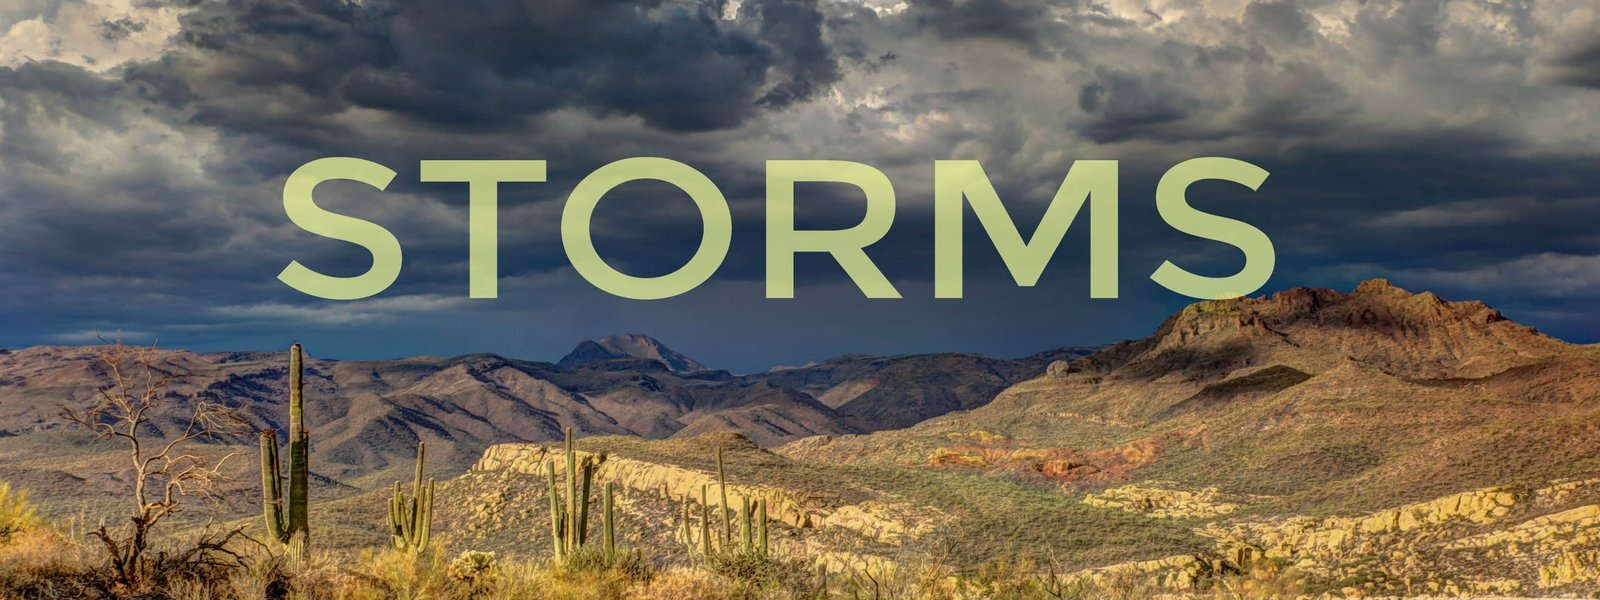 rev-slider_storms_text